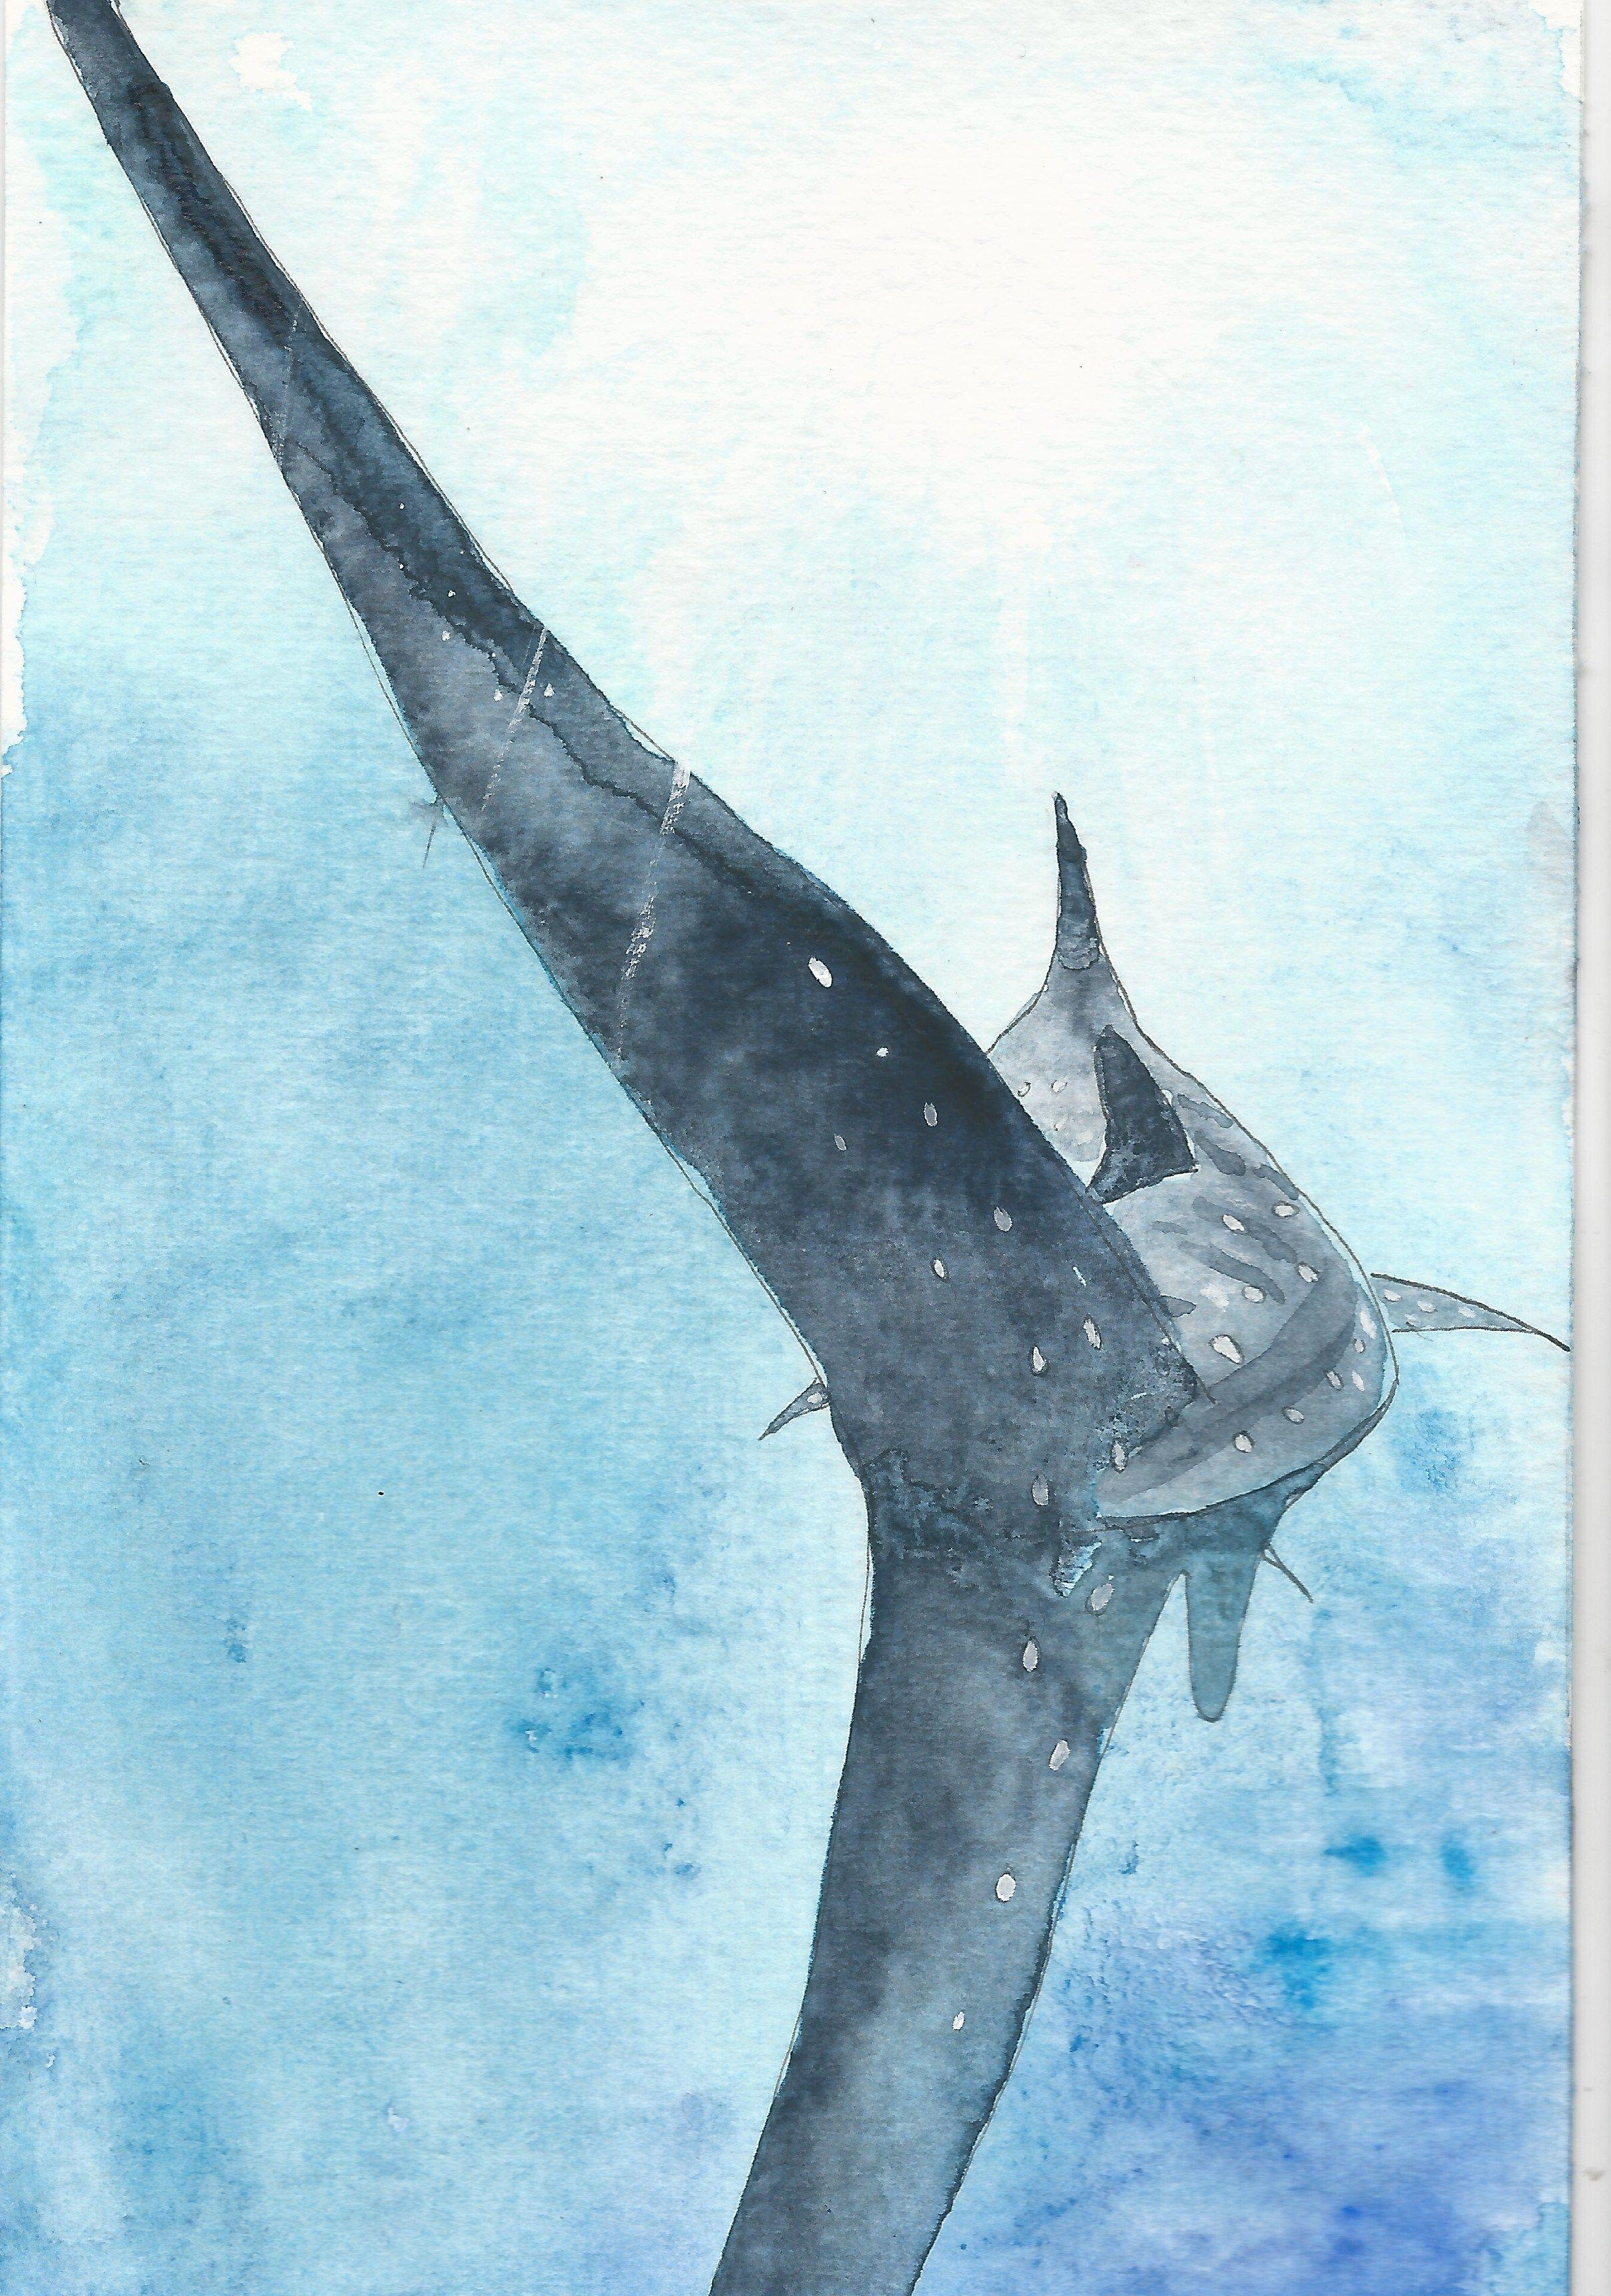 Hammerhead Shark Abstract Watercolor Painting Art Print by Artist DJ Rogers